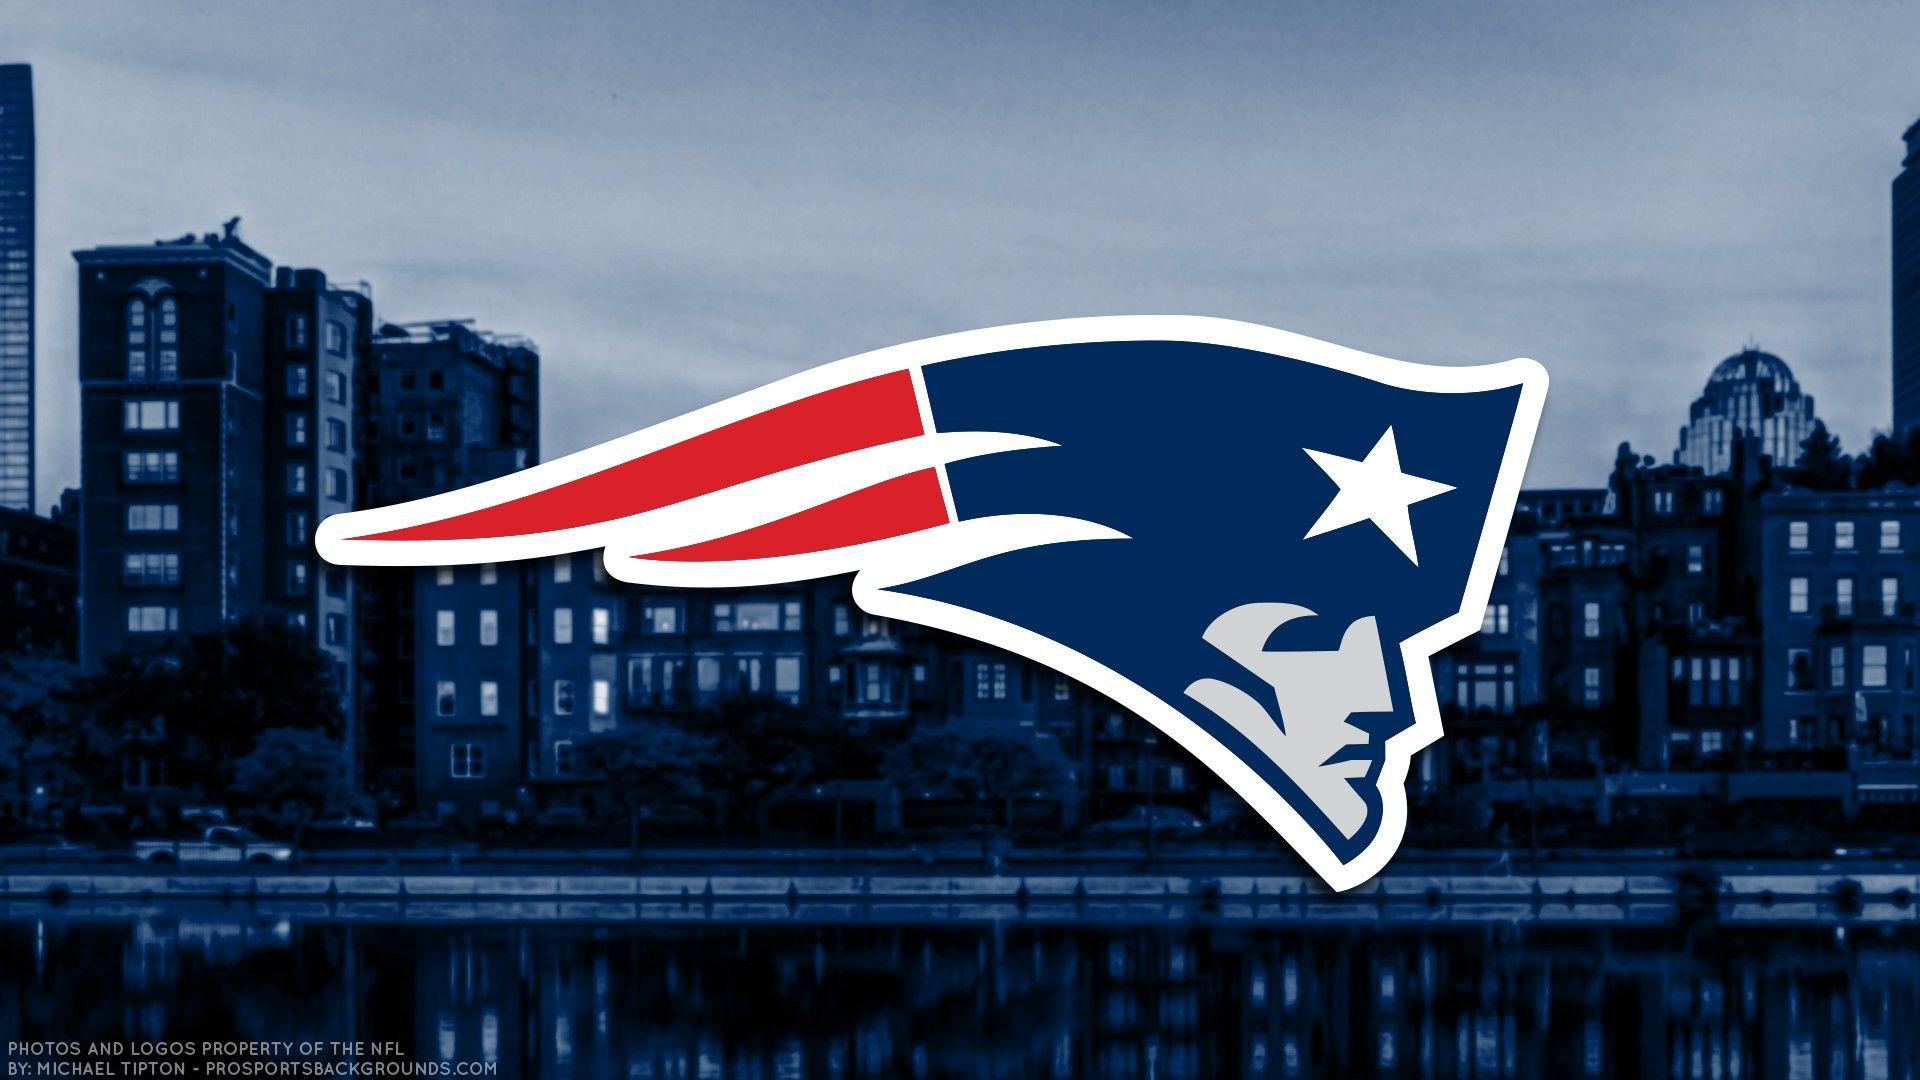 New England Patriots Mac Backgrounds 2020 Nfl Football Wallpapers New England Patriots New England Patriots Wallpaper New England Patriots Memes